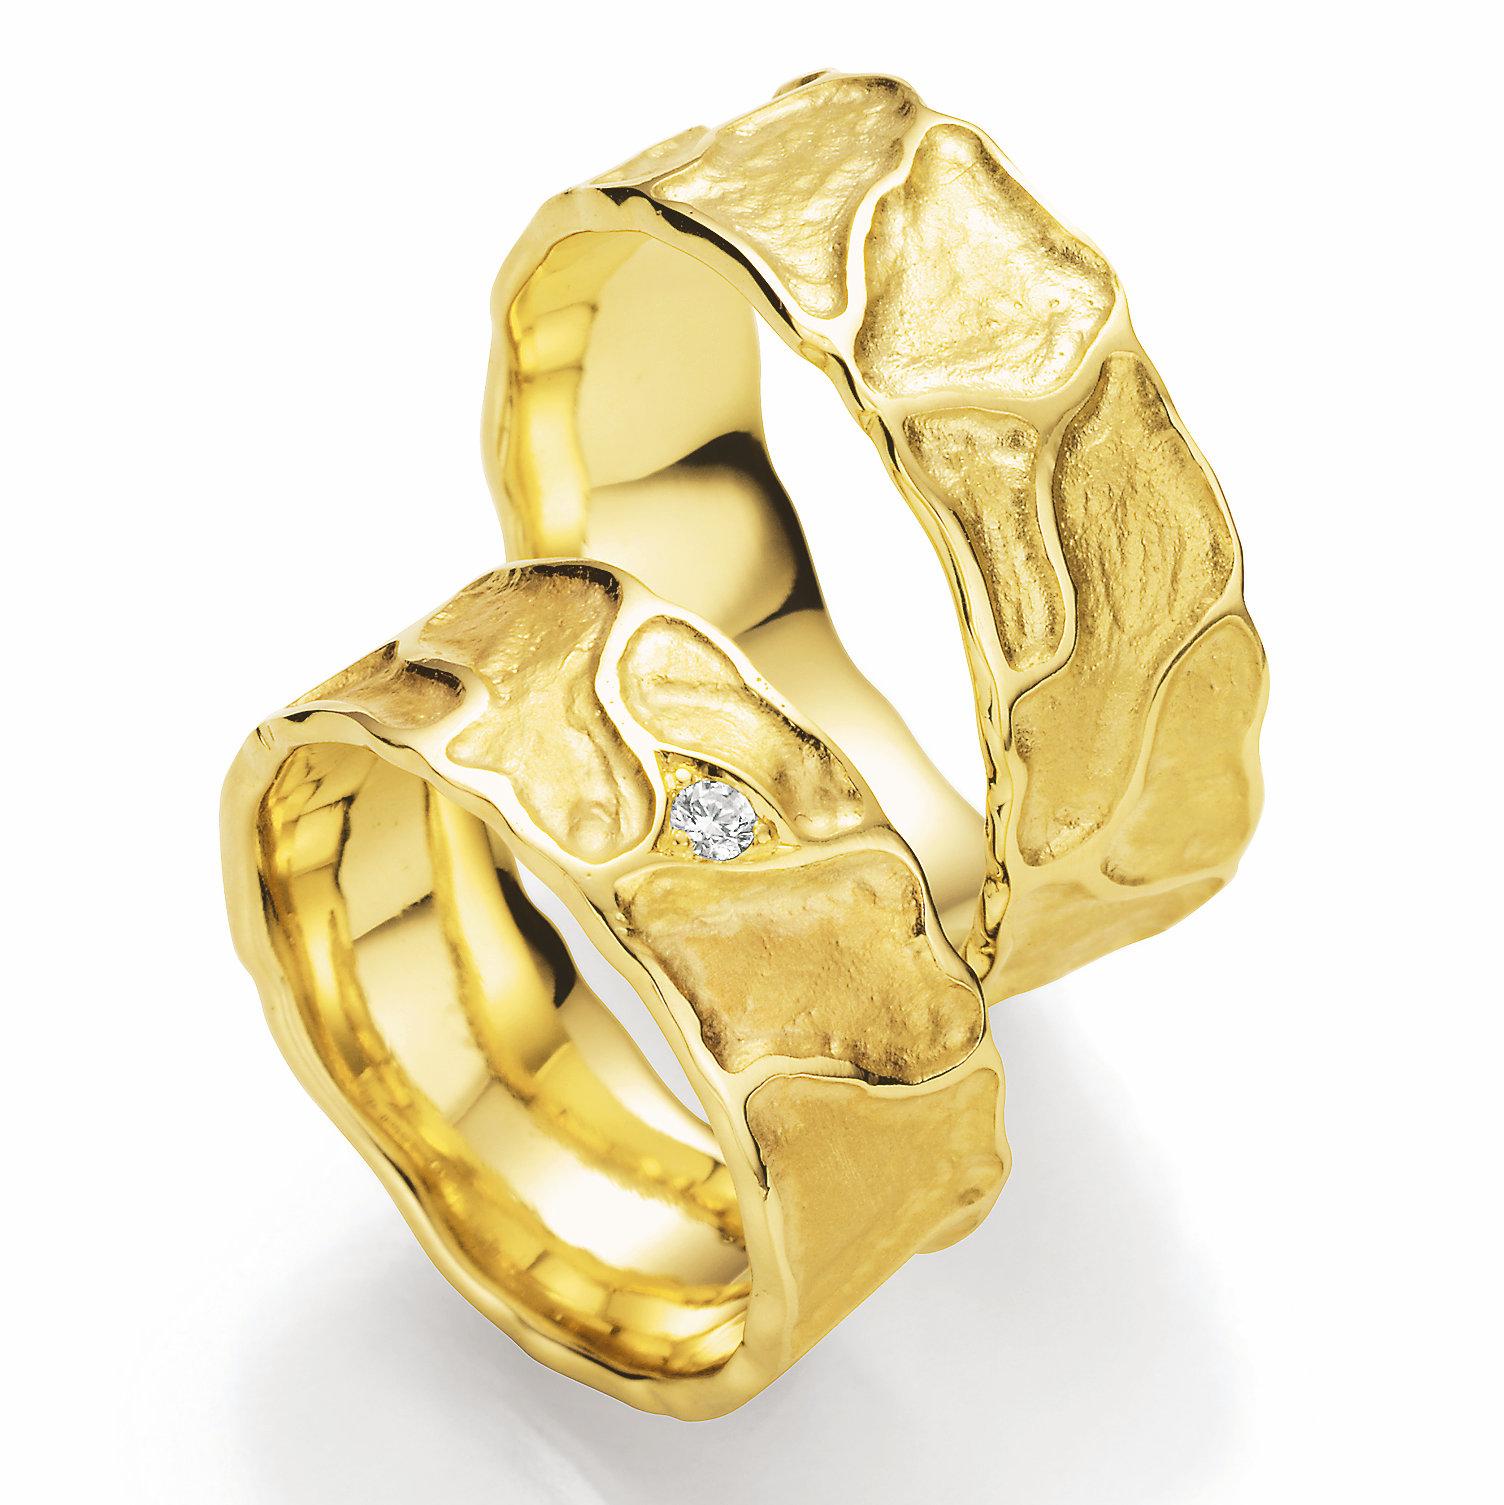 EheringeShop  Vulkano Eheringe aus 585 Gelbgold P22540